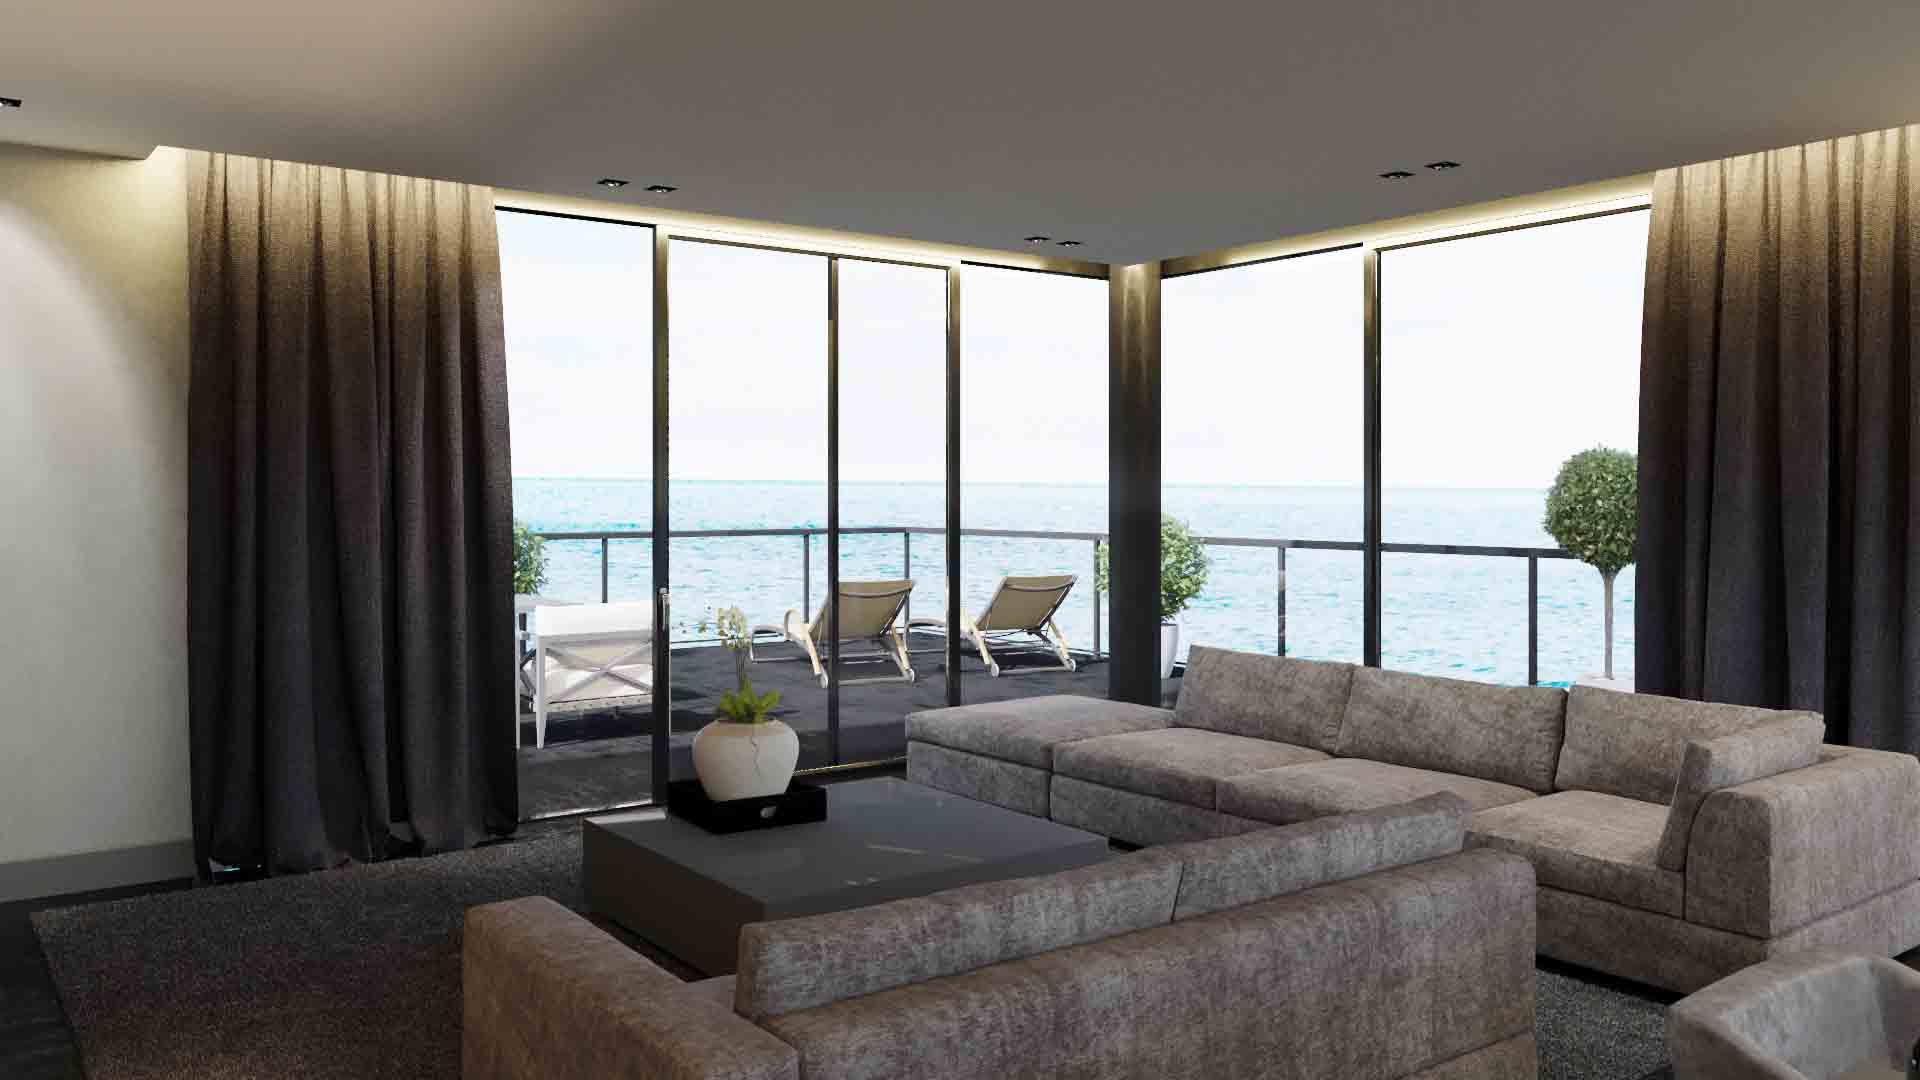 Penthouse-almere-duin-poort-nieuwbouw-duin-interior.02